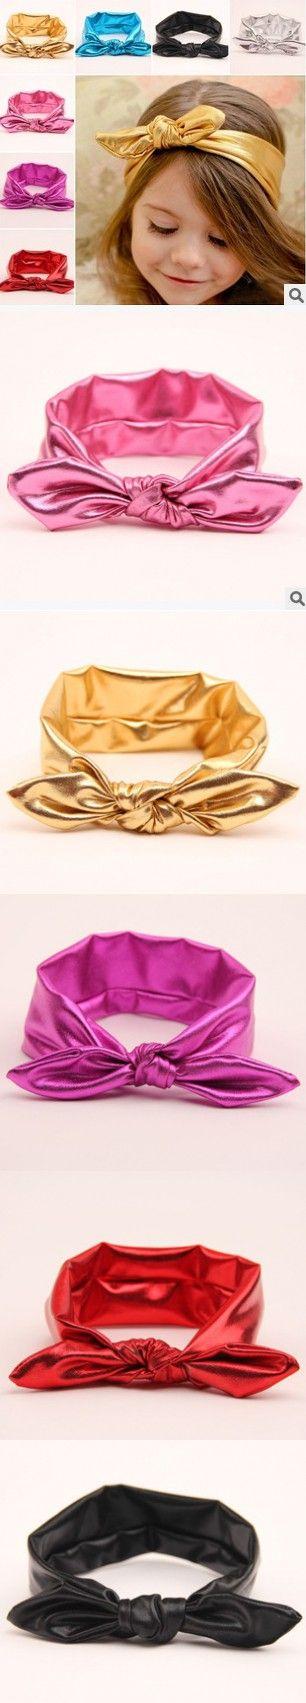 2015 Stylish lovely baby hair accessories rabbit ear headband headscarf baby headbands knot hair band for girl free shipping $1.59